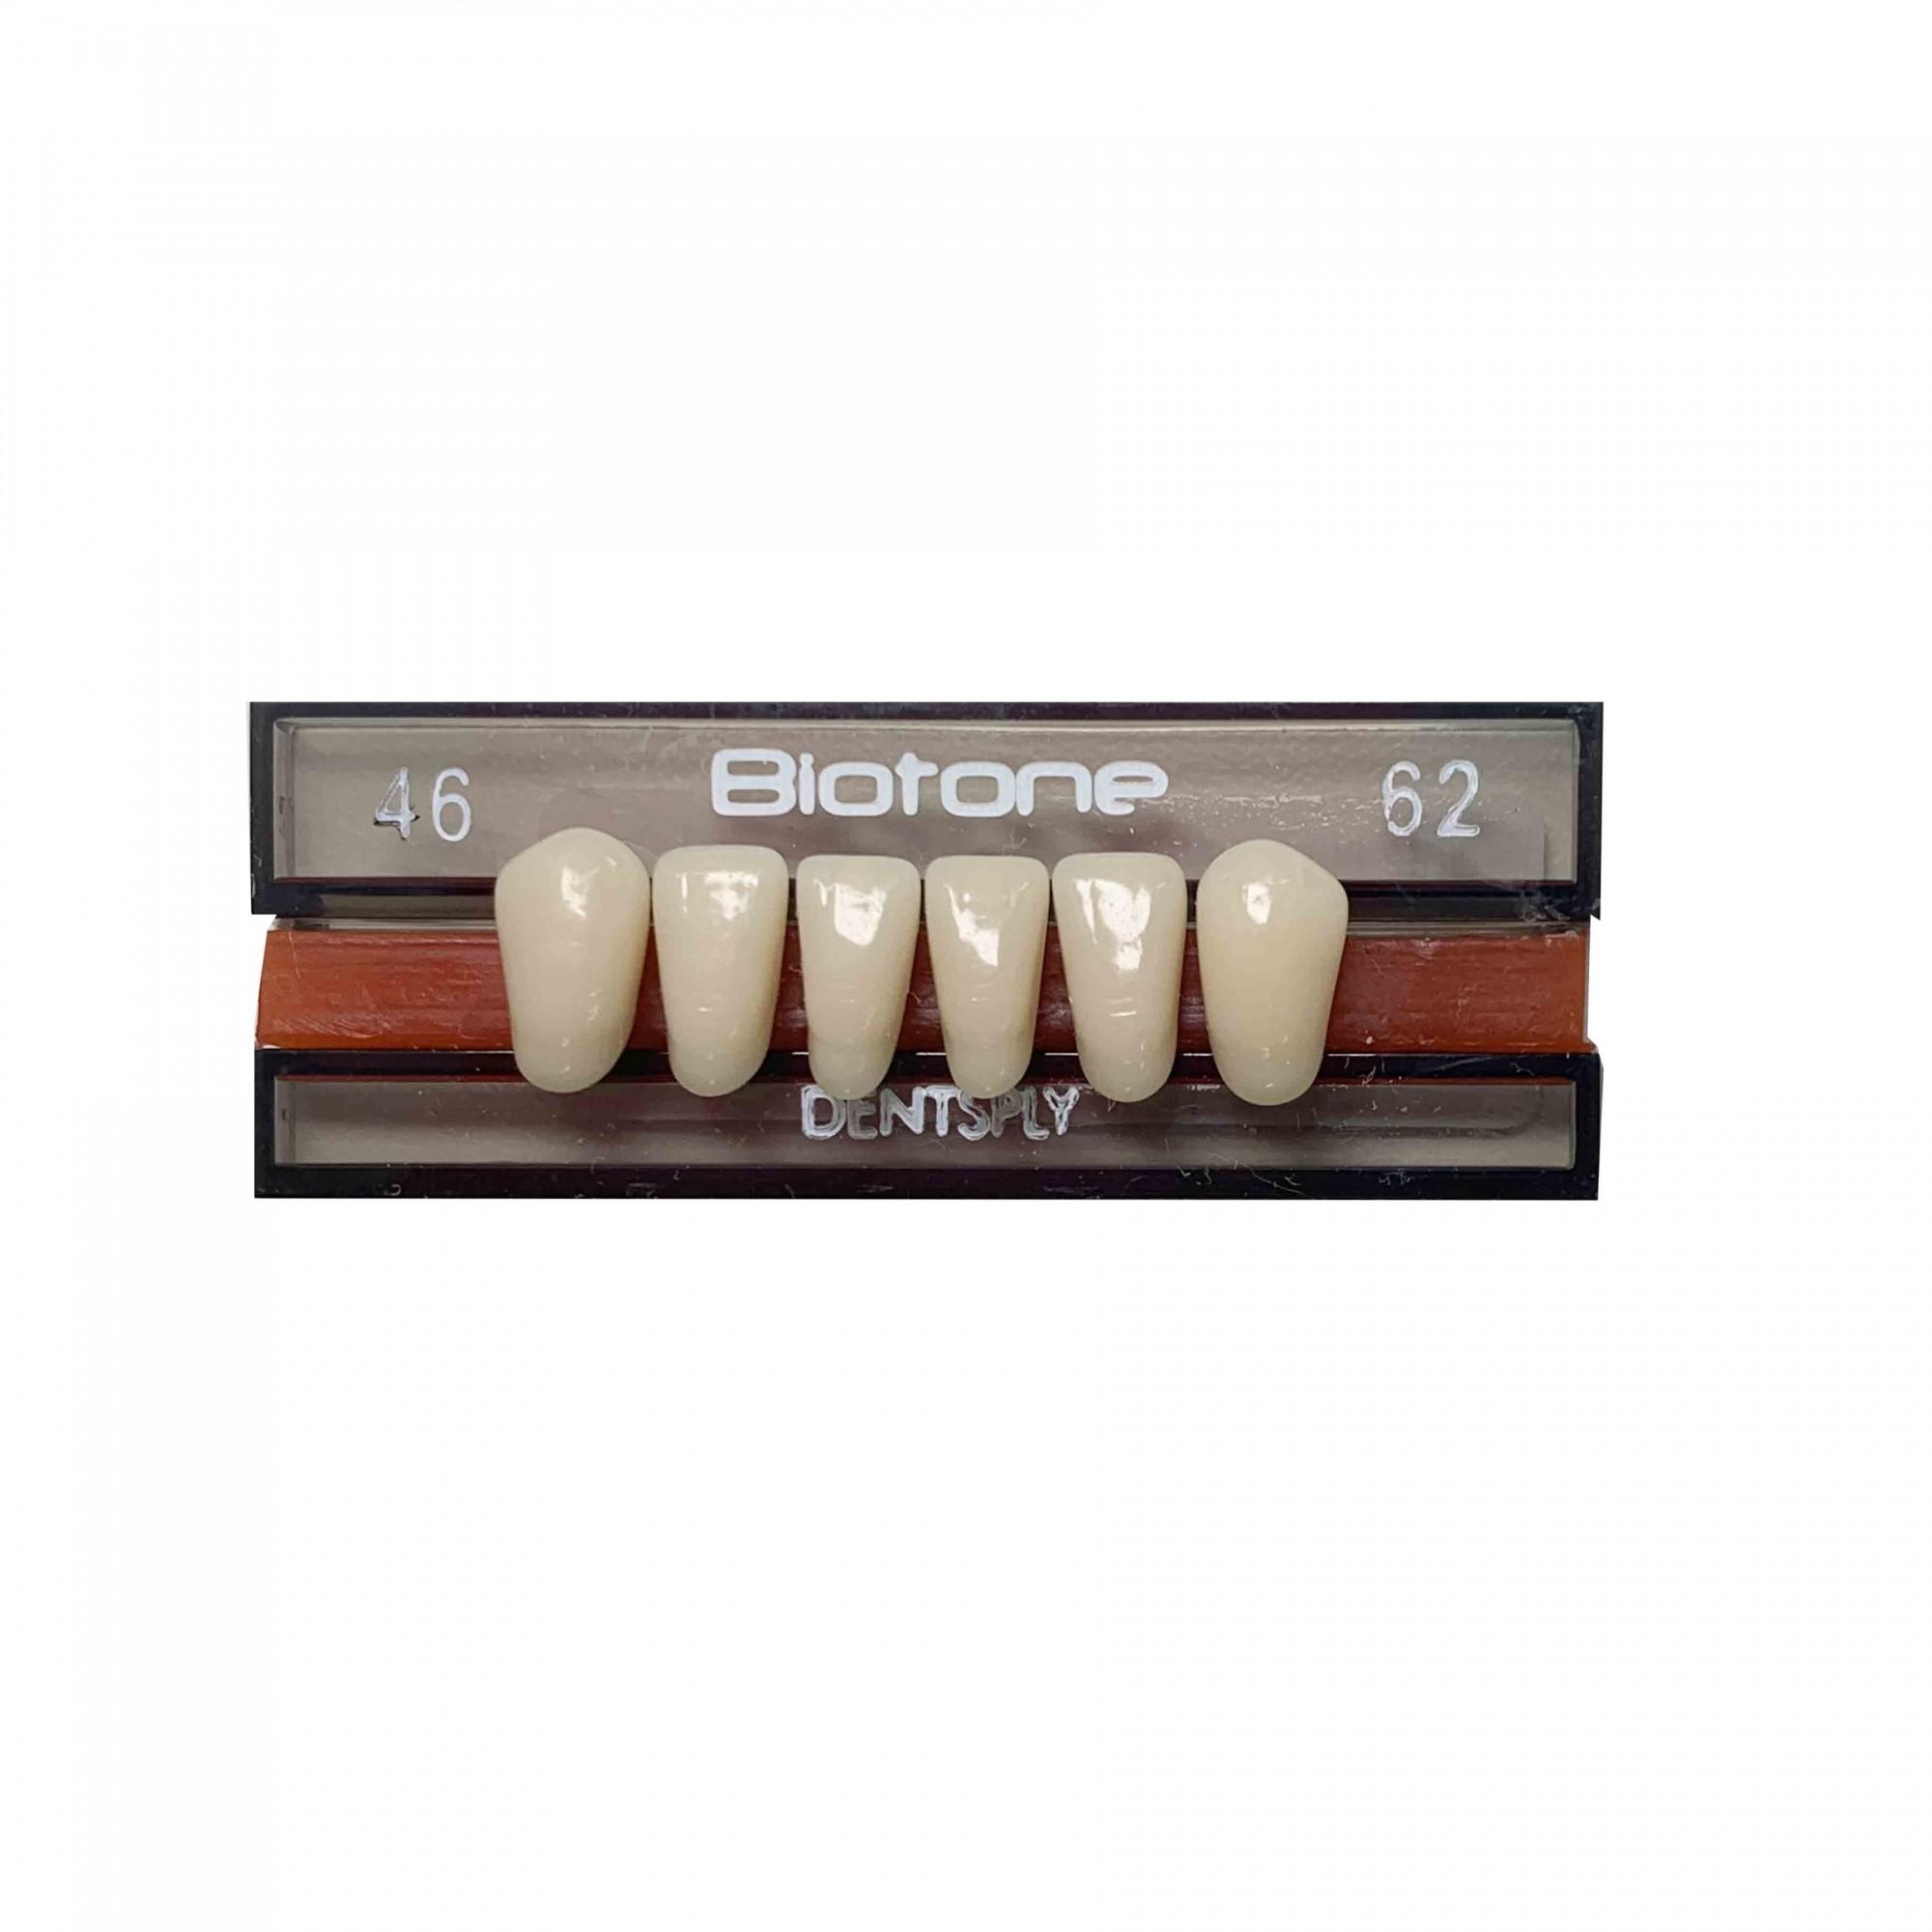 Dente Biotone 46 Anterior Inferior - Dentsply Sirona